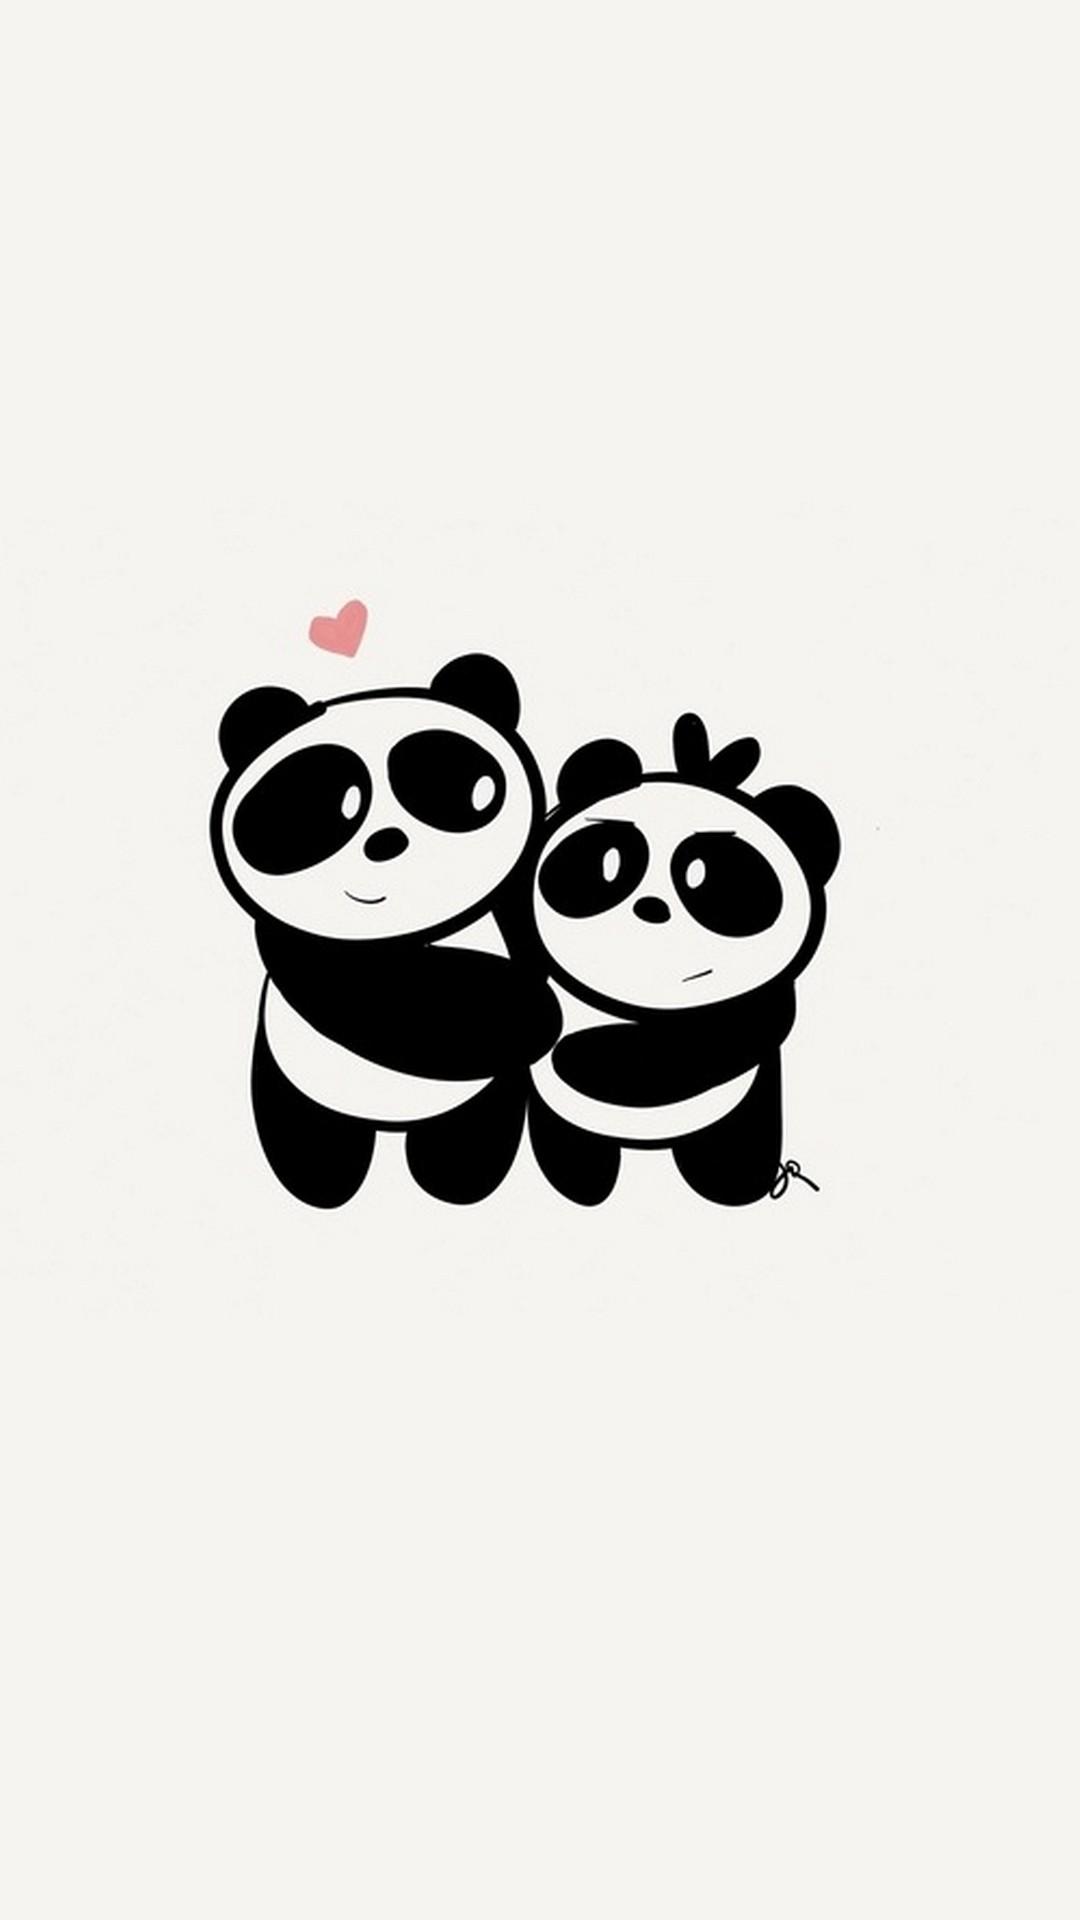 Cute Cartoon Couple Wallpapers Samsung C3300k Champ Cute Cartoon